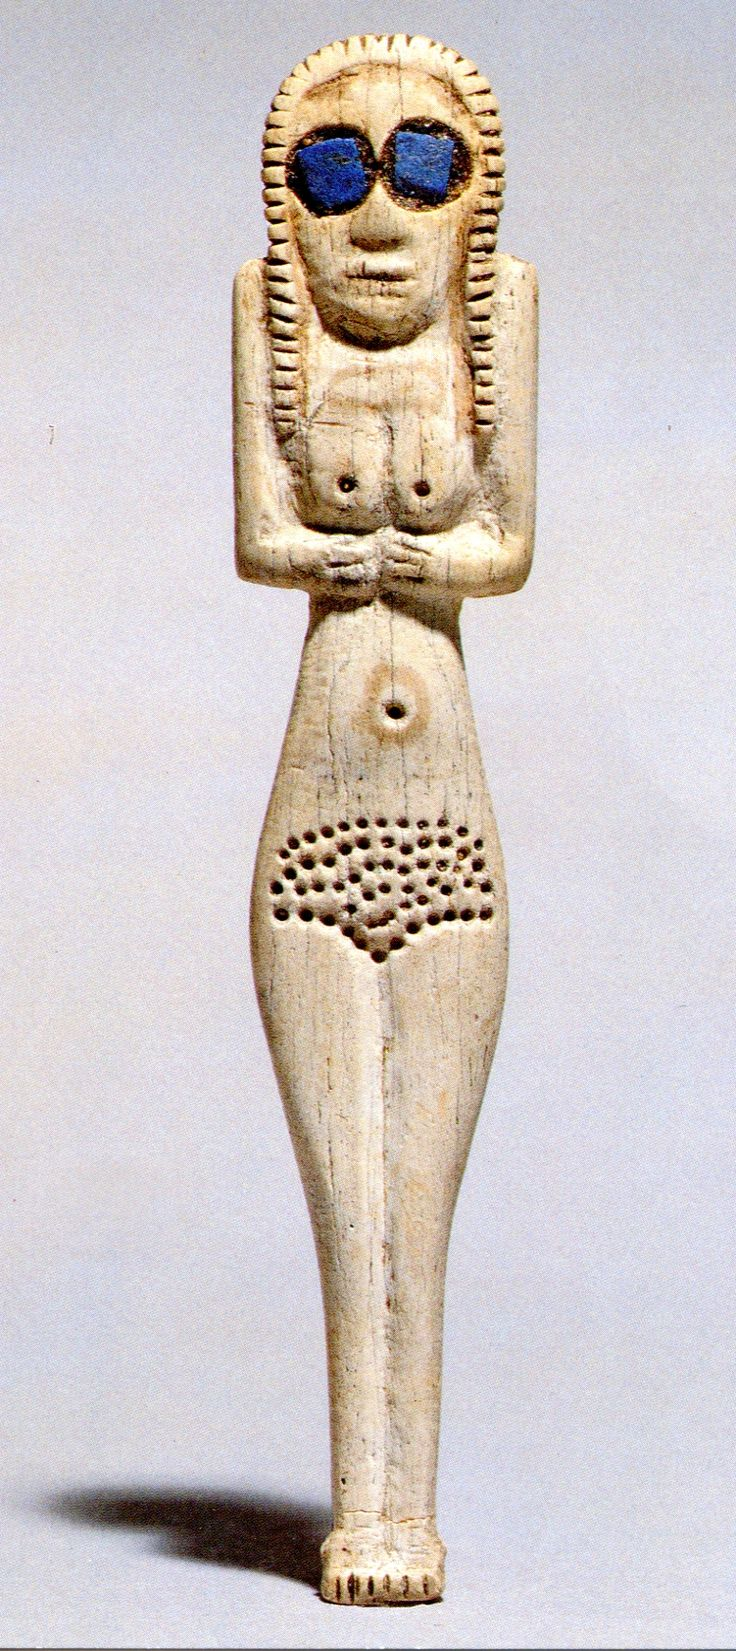 Las Sumerias hacían topples.  El fachoislamismo te lapida.   Sumerian bone-carved topless Inanna figurine wearing cool lapis lazuli sunglasses C.3600 BC